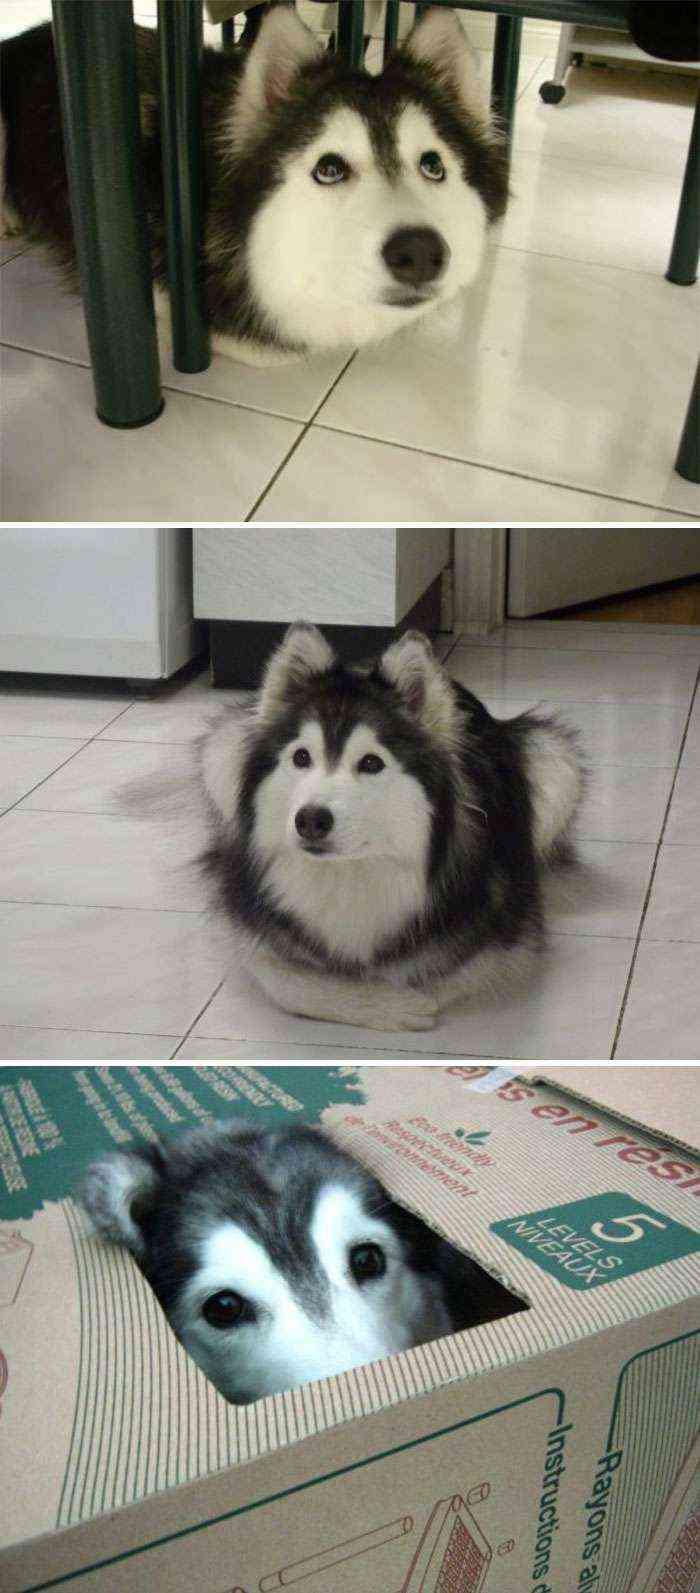 Fue criado por gatos, así que actúa como ellos